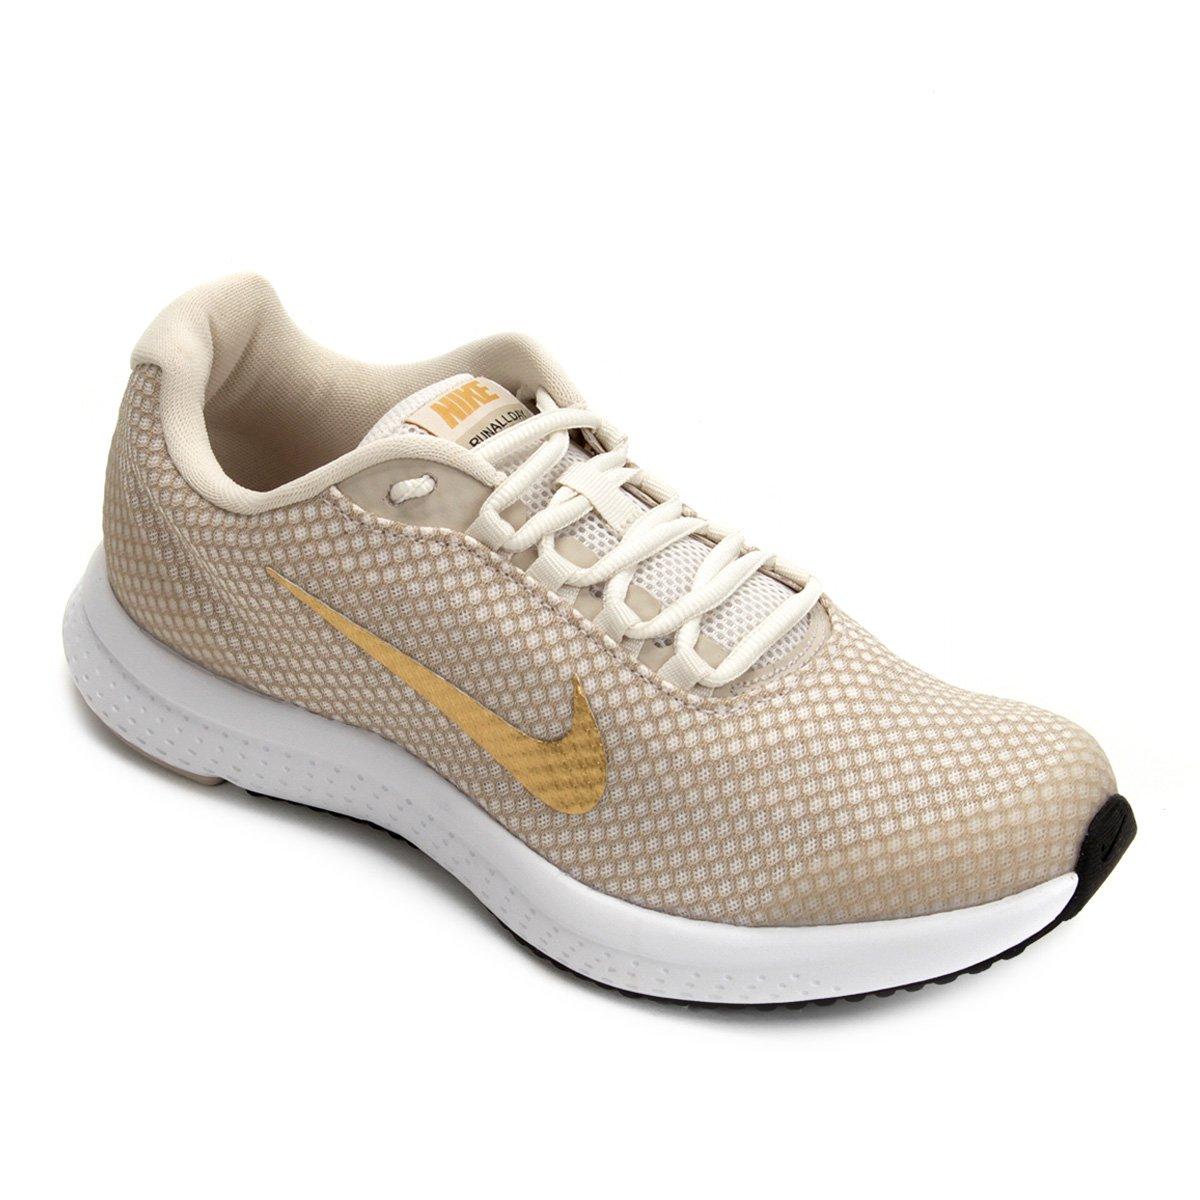 30adba48874 Tênis Nike Runallday Feminino - Bege e Dourado - Compre Agora